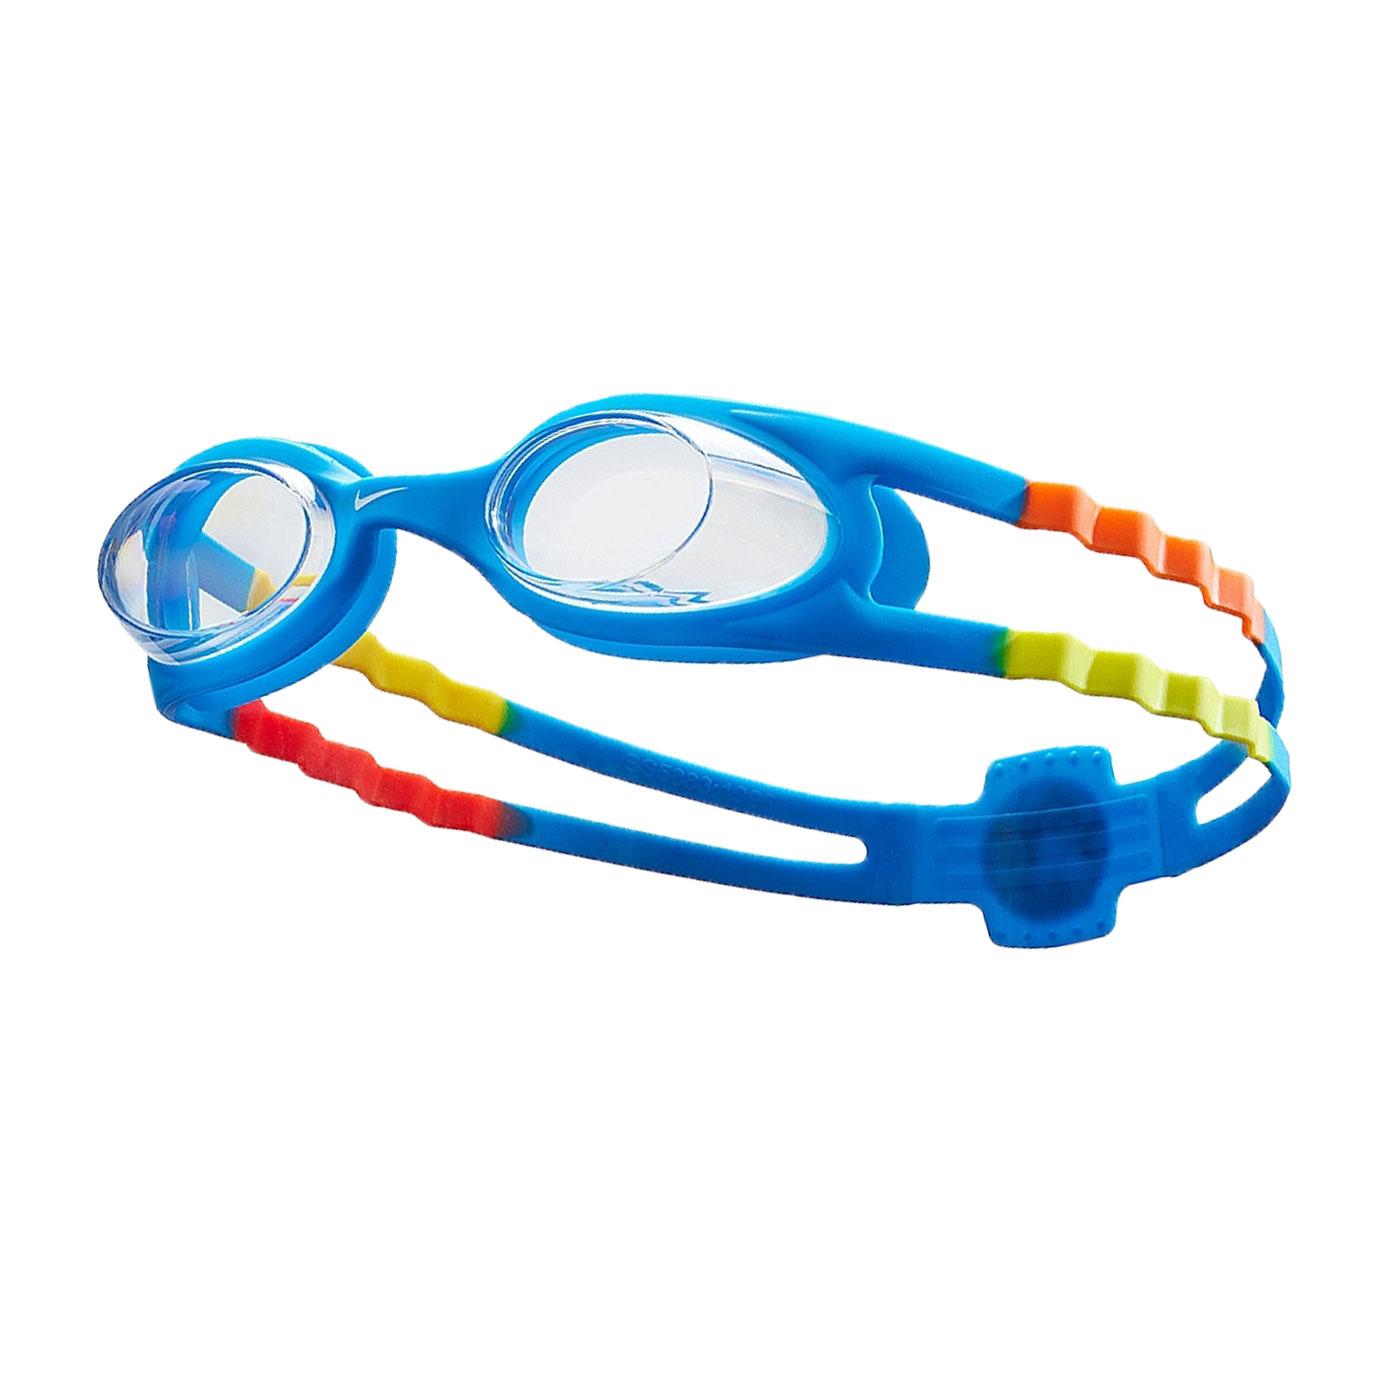 NIKE SWIM 兒童休閒泳鏡 NESSB166-401 - 寶藍黃橘